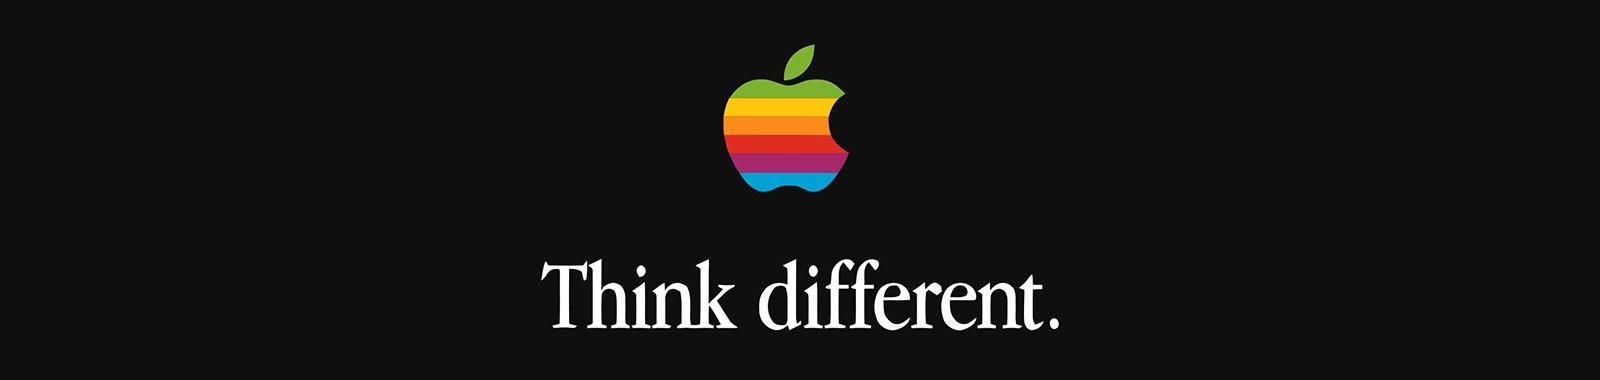 Think_Different_eye